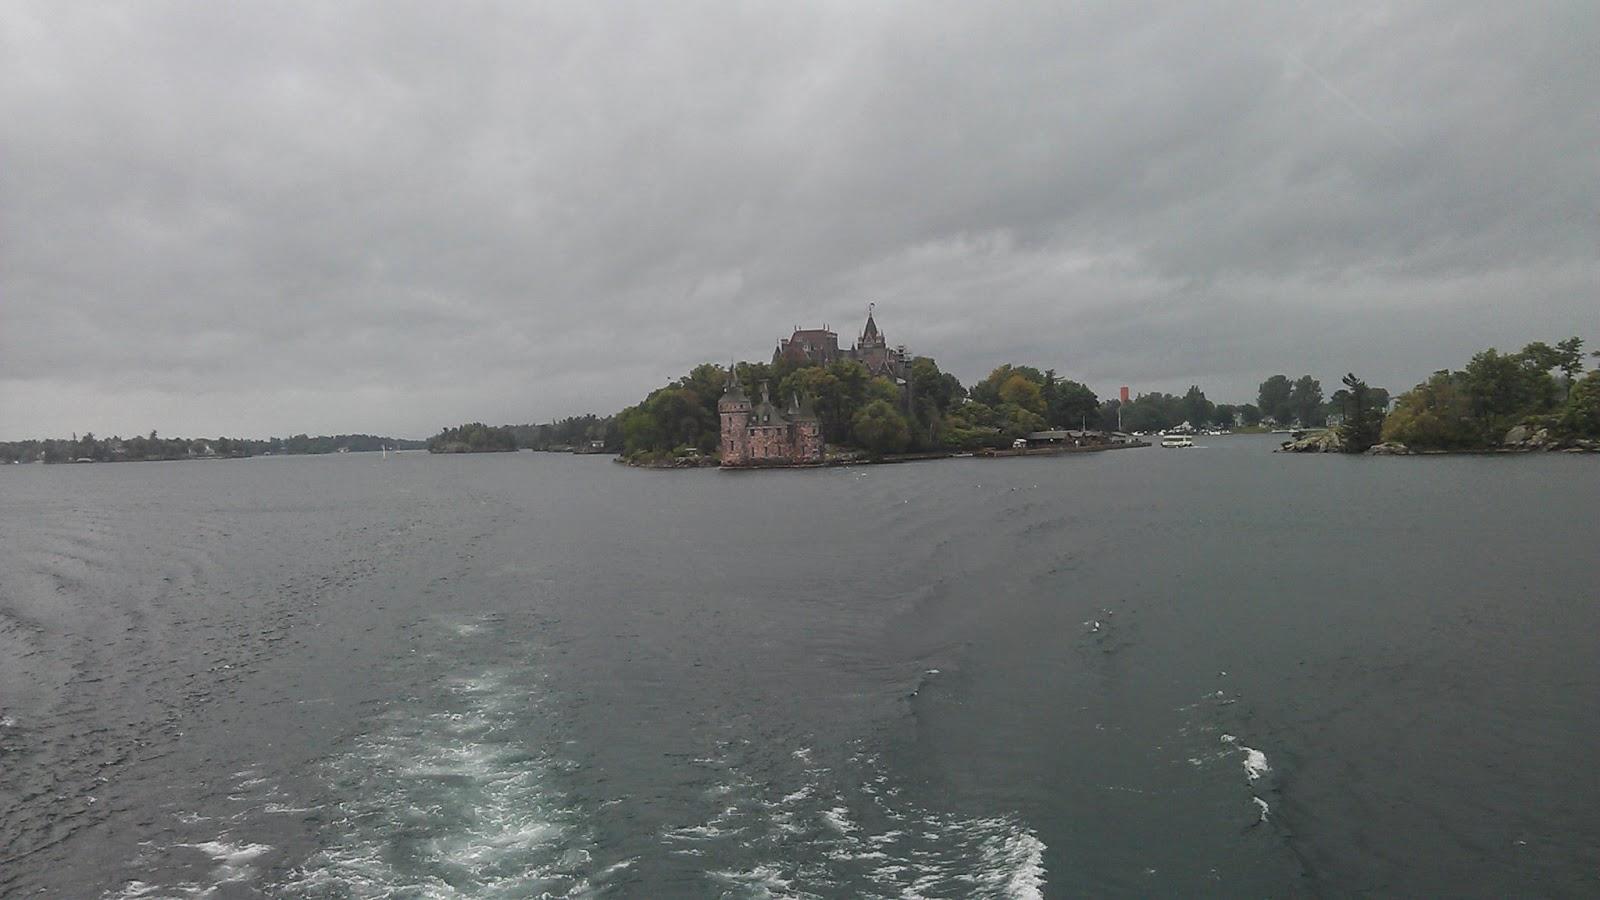 2012 Summer 美國加拿大東岸自駕行程∶千島湖遊記 (Thousand Island Lake)